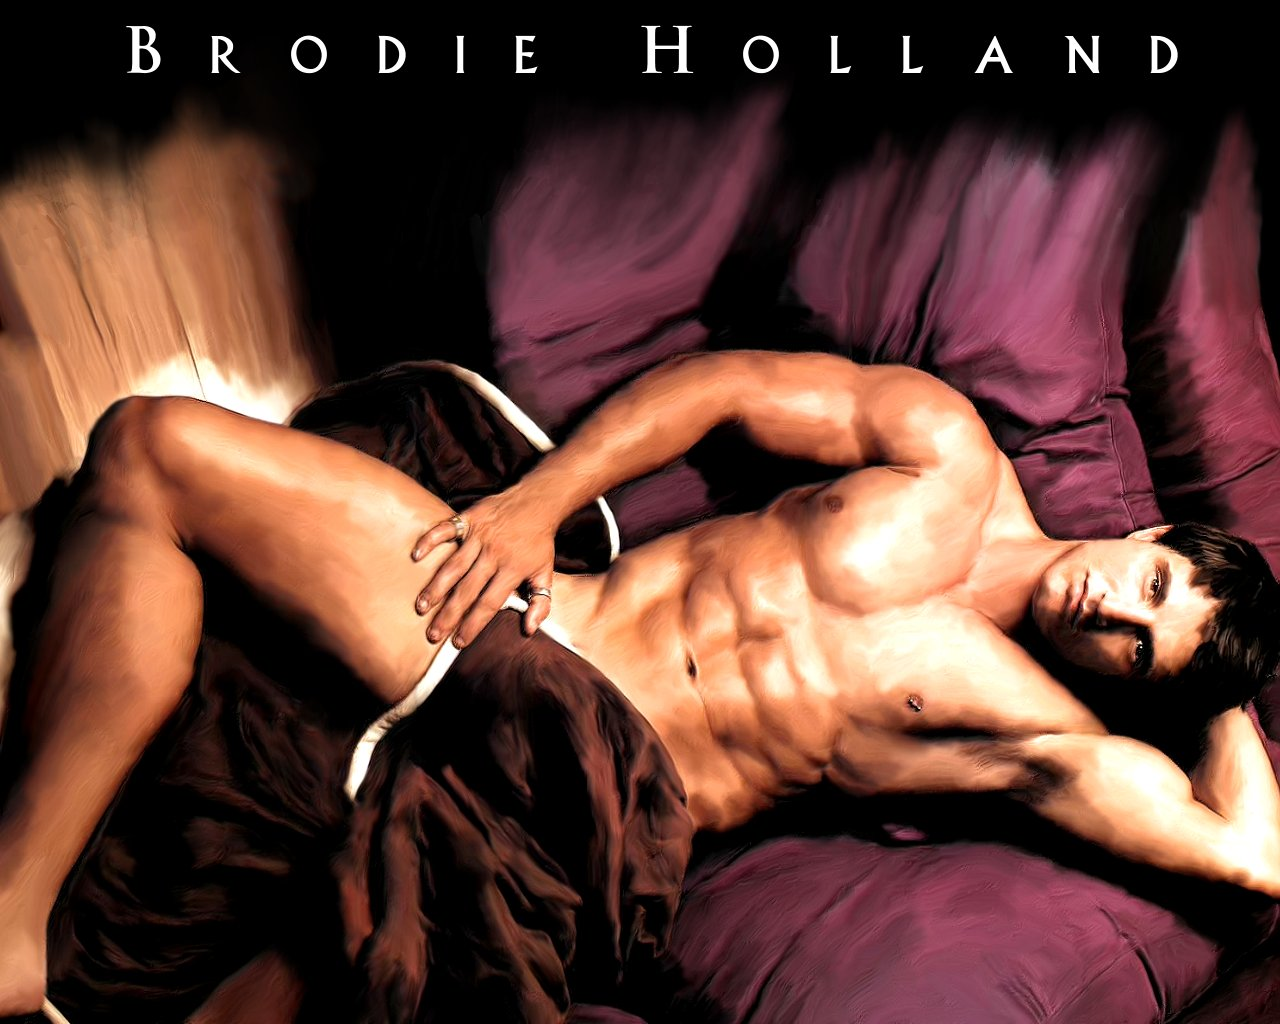 http://4.bp.blogspot.com/_3aWLy0LdahY/R1Hn_Ce0xkI/AAAAAAAAATU/h-gXhdQZ6m4/s1600-R/Brodie+Holland+-+Wallpaper.jpeg